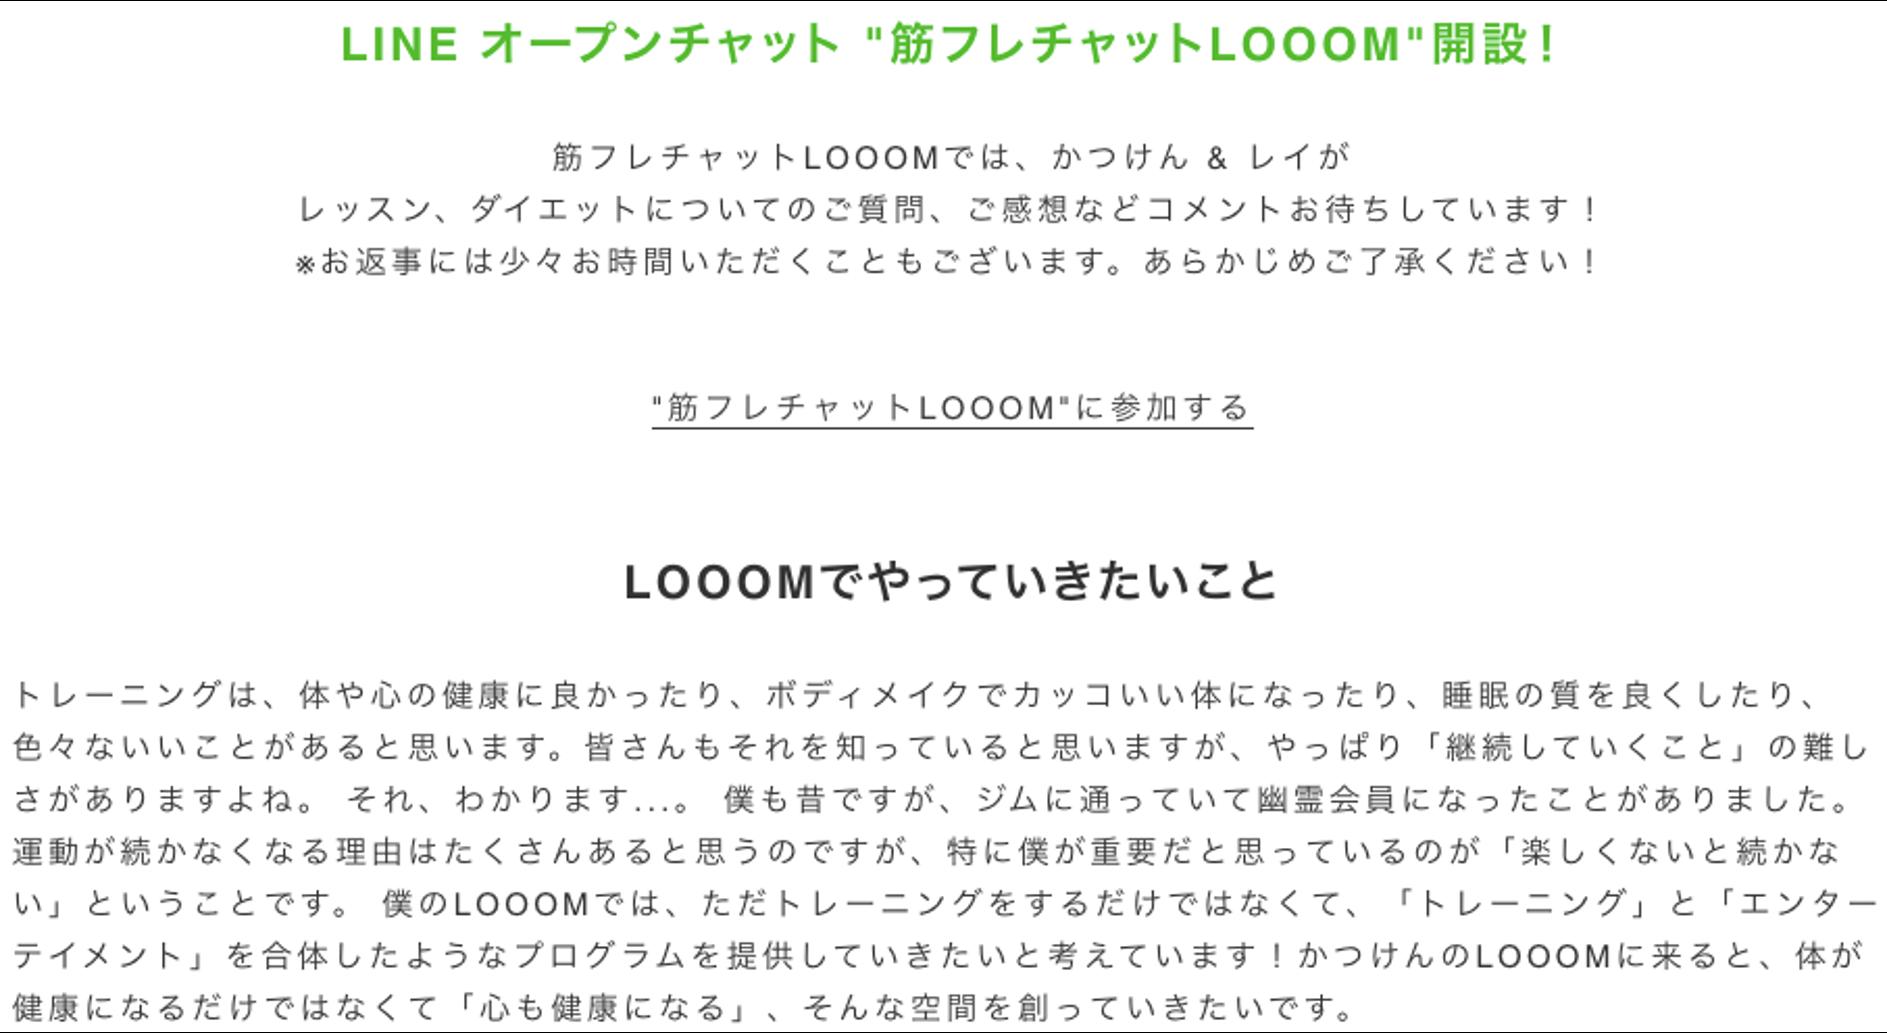 LOOOMインストラクター②